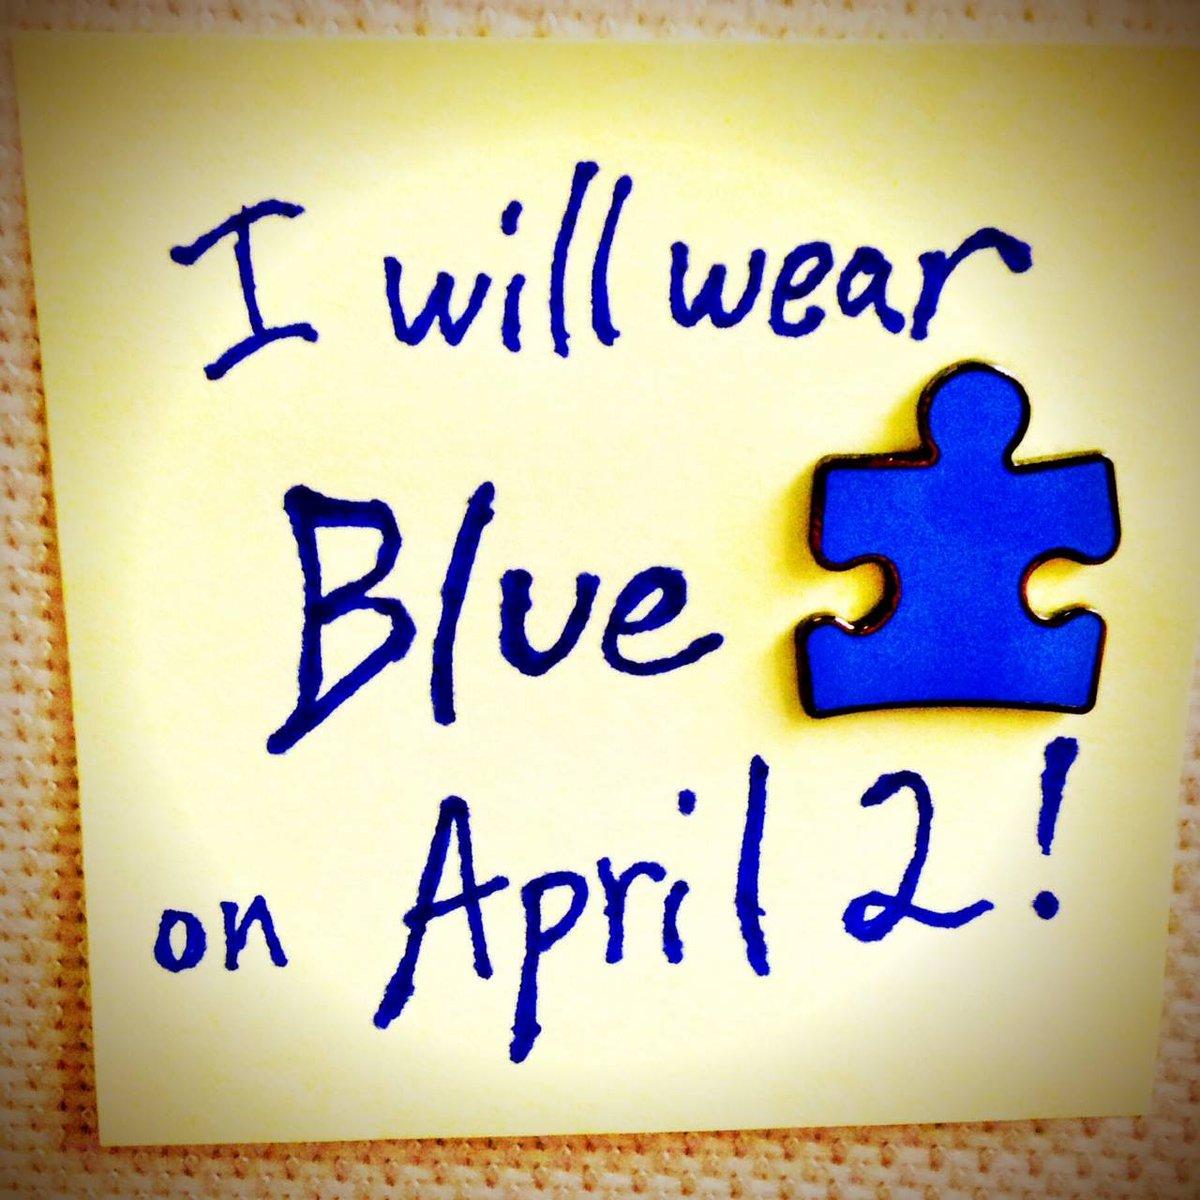 WorldAutismAwarenessDay: Are You Wearing Blue